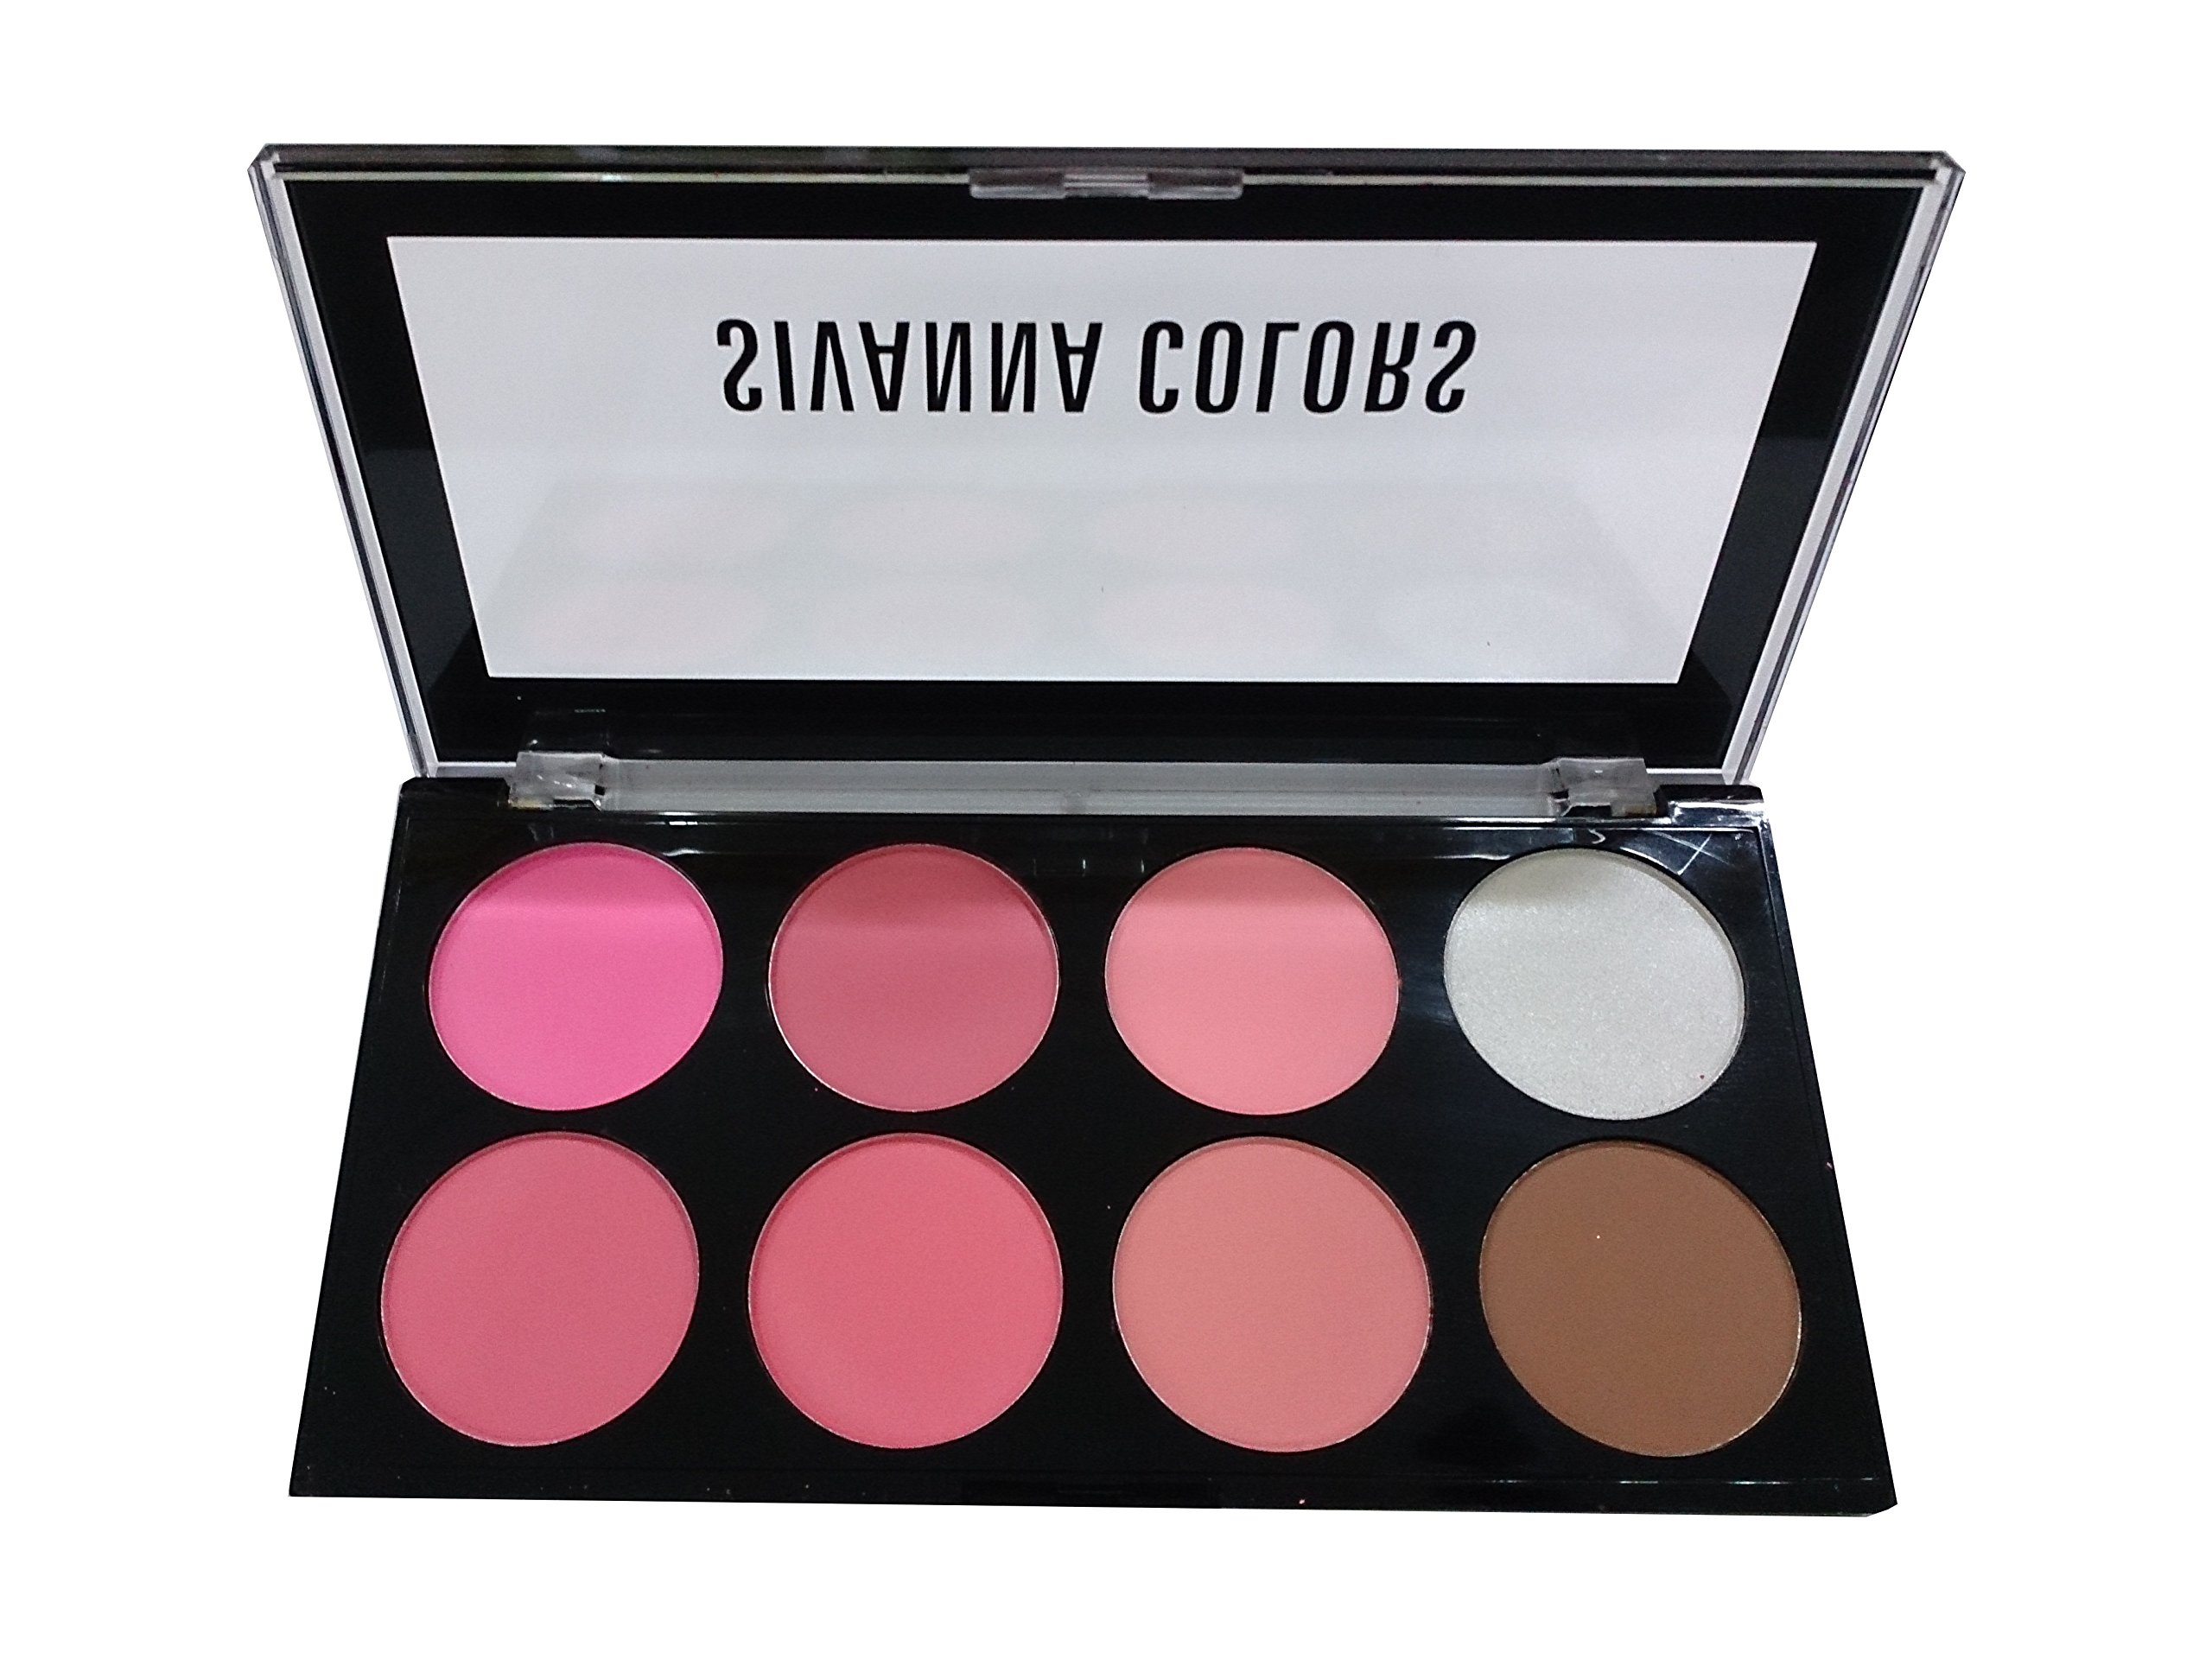 Sivanna 8 Colours Ultra Blush Palette product image